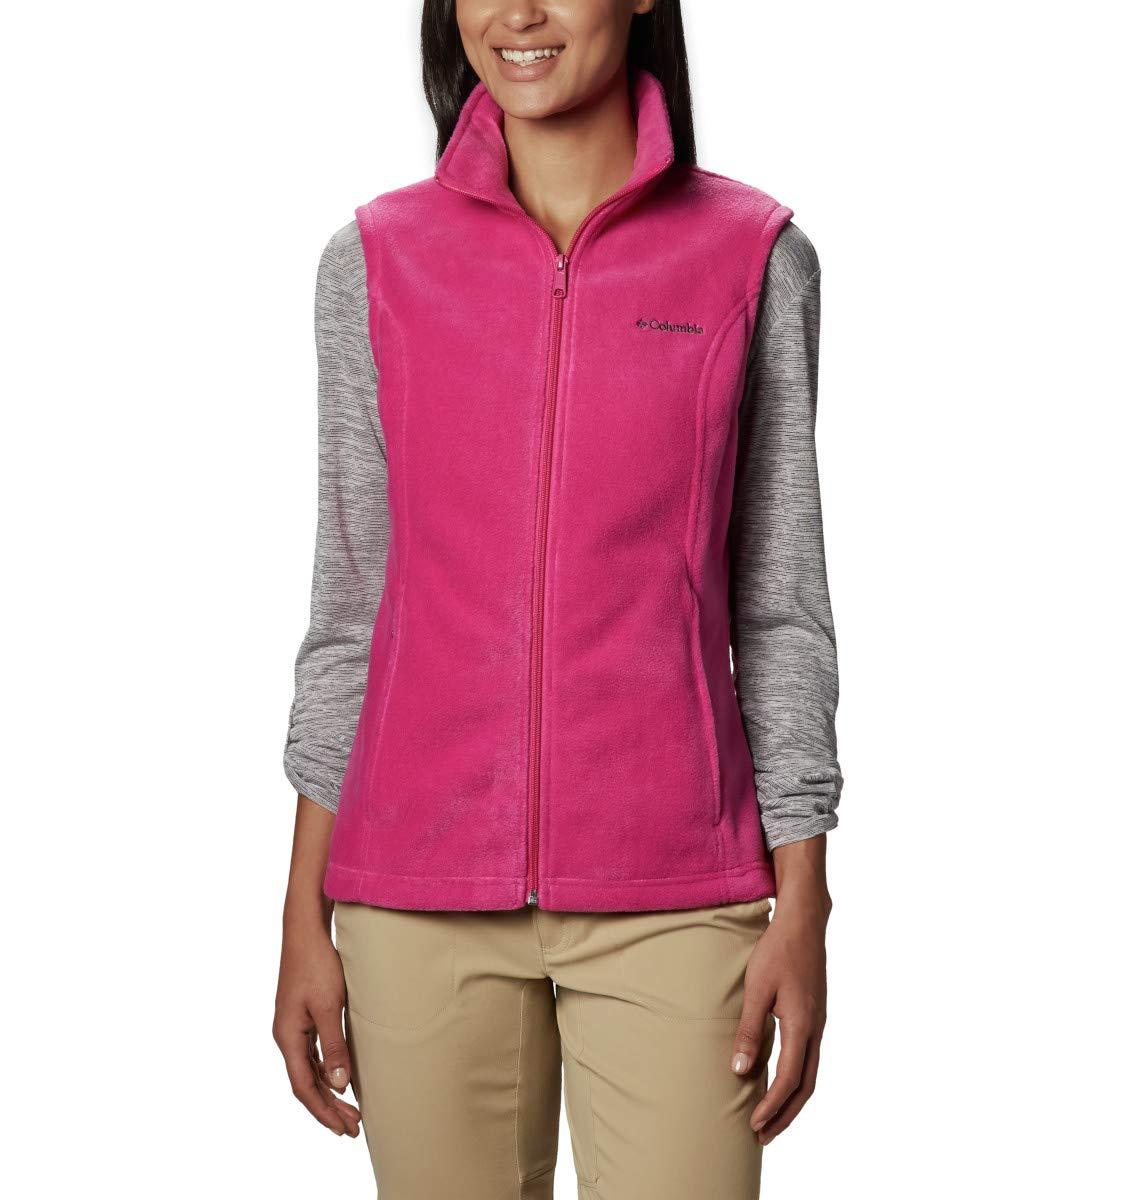 Columbia Women's Petite Benton Springs Vest, Fuchsia, Petite X-Small by Columbia